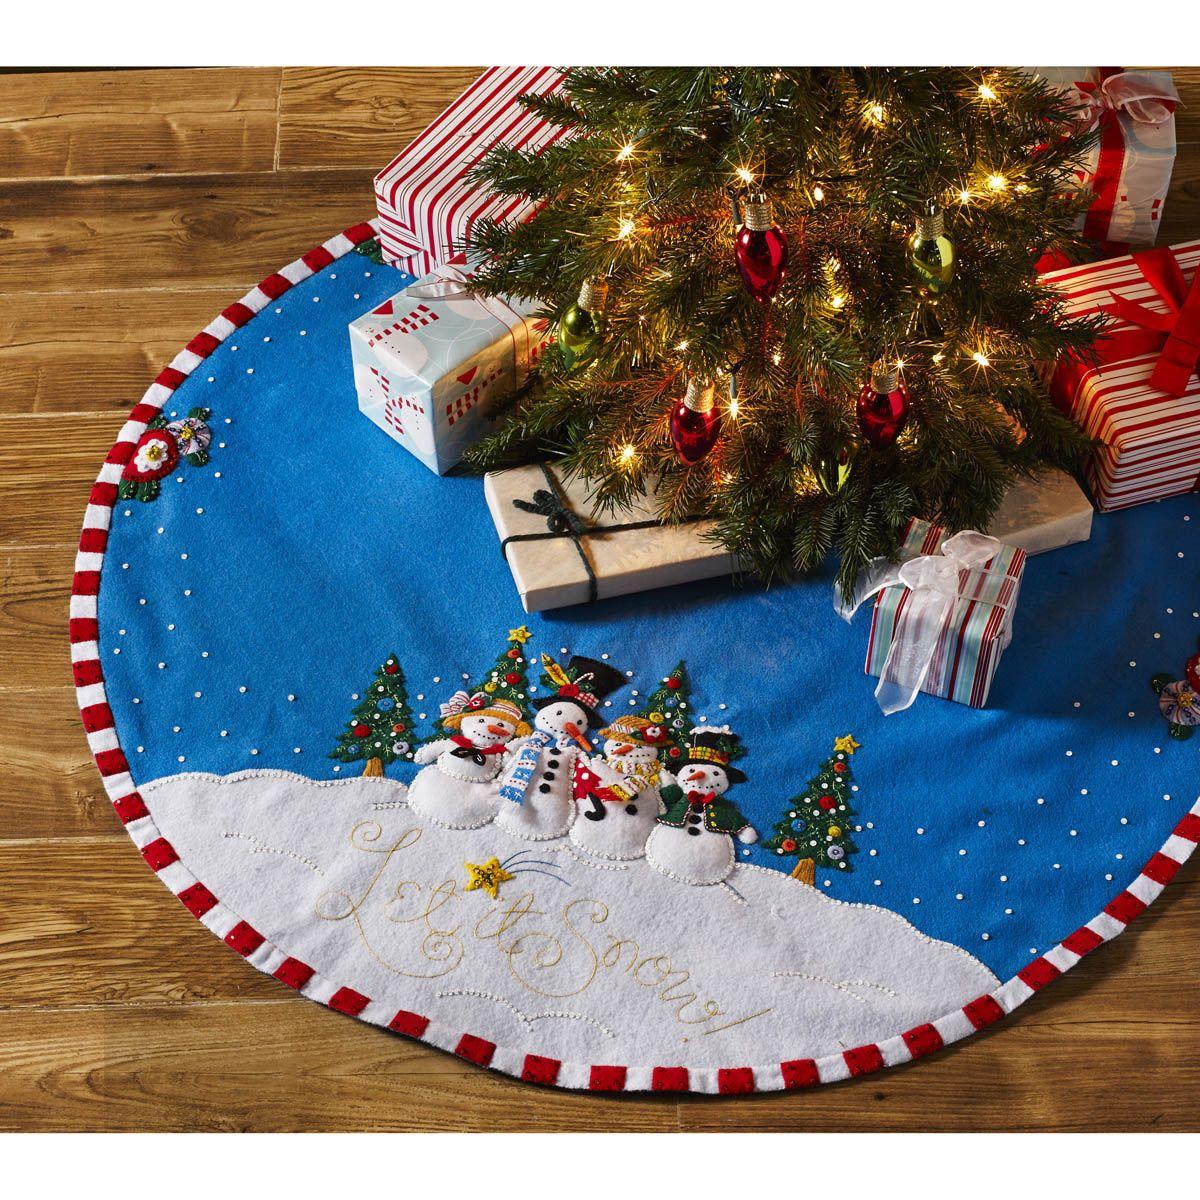 Bucilla Seasonal Felt Tree Skirt Kits Mary Engelbreit Let It Snow Felt Christmas Tree Felt Christmas Christmas Tree Skirt